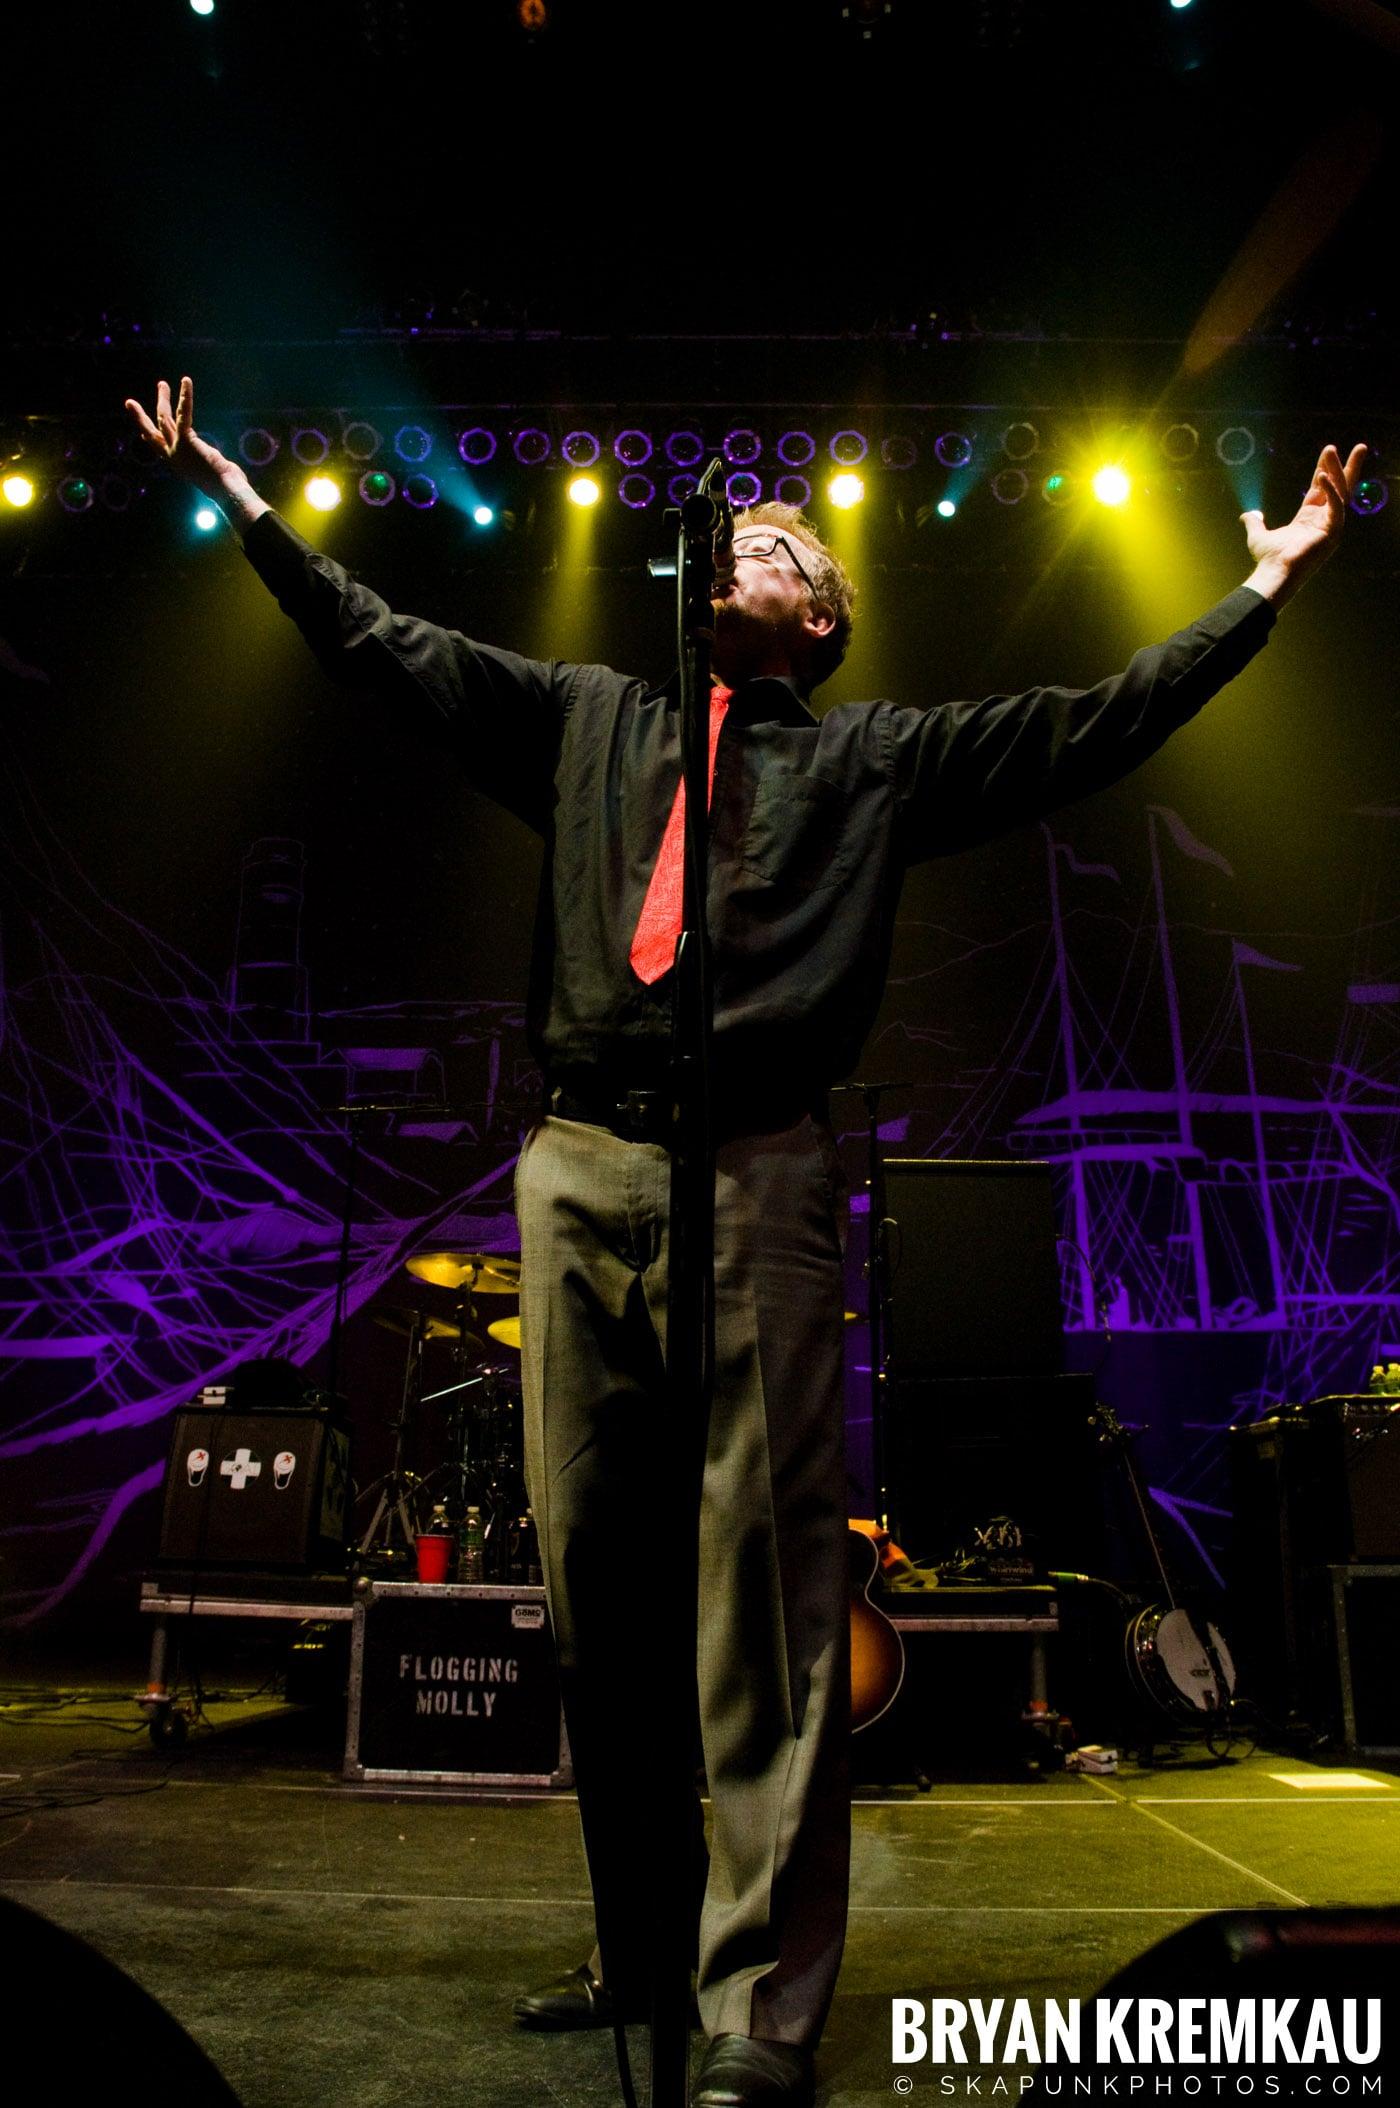 Flogging Molly @ Hammerstein Ballroom, NYC - 3.2.10 (3)